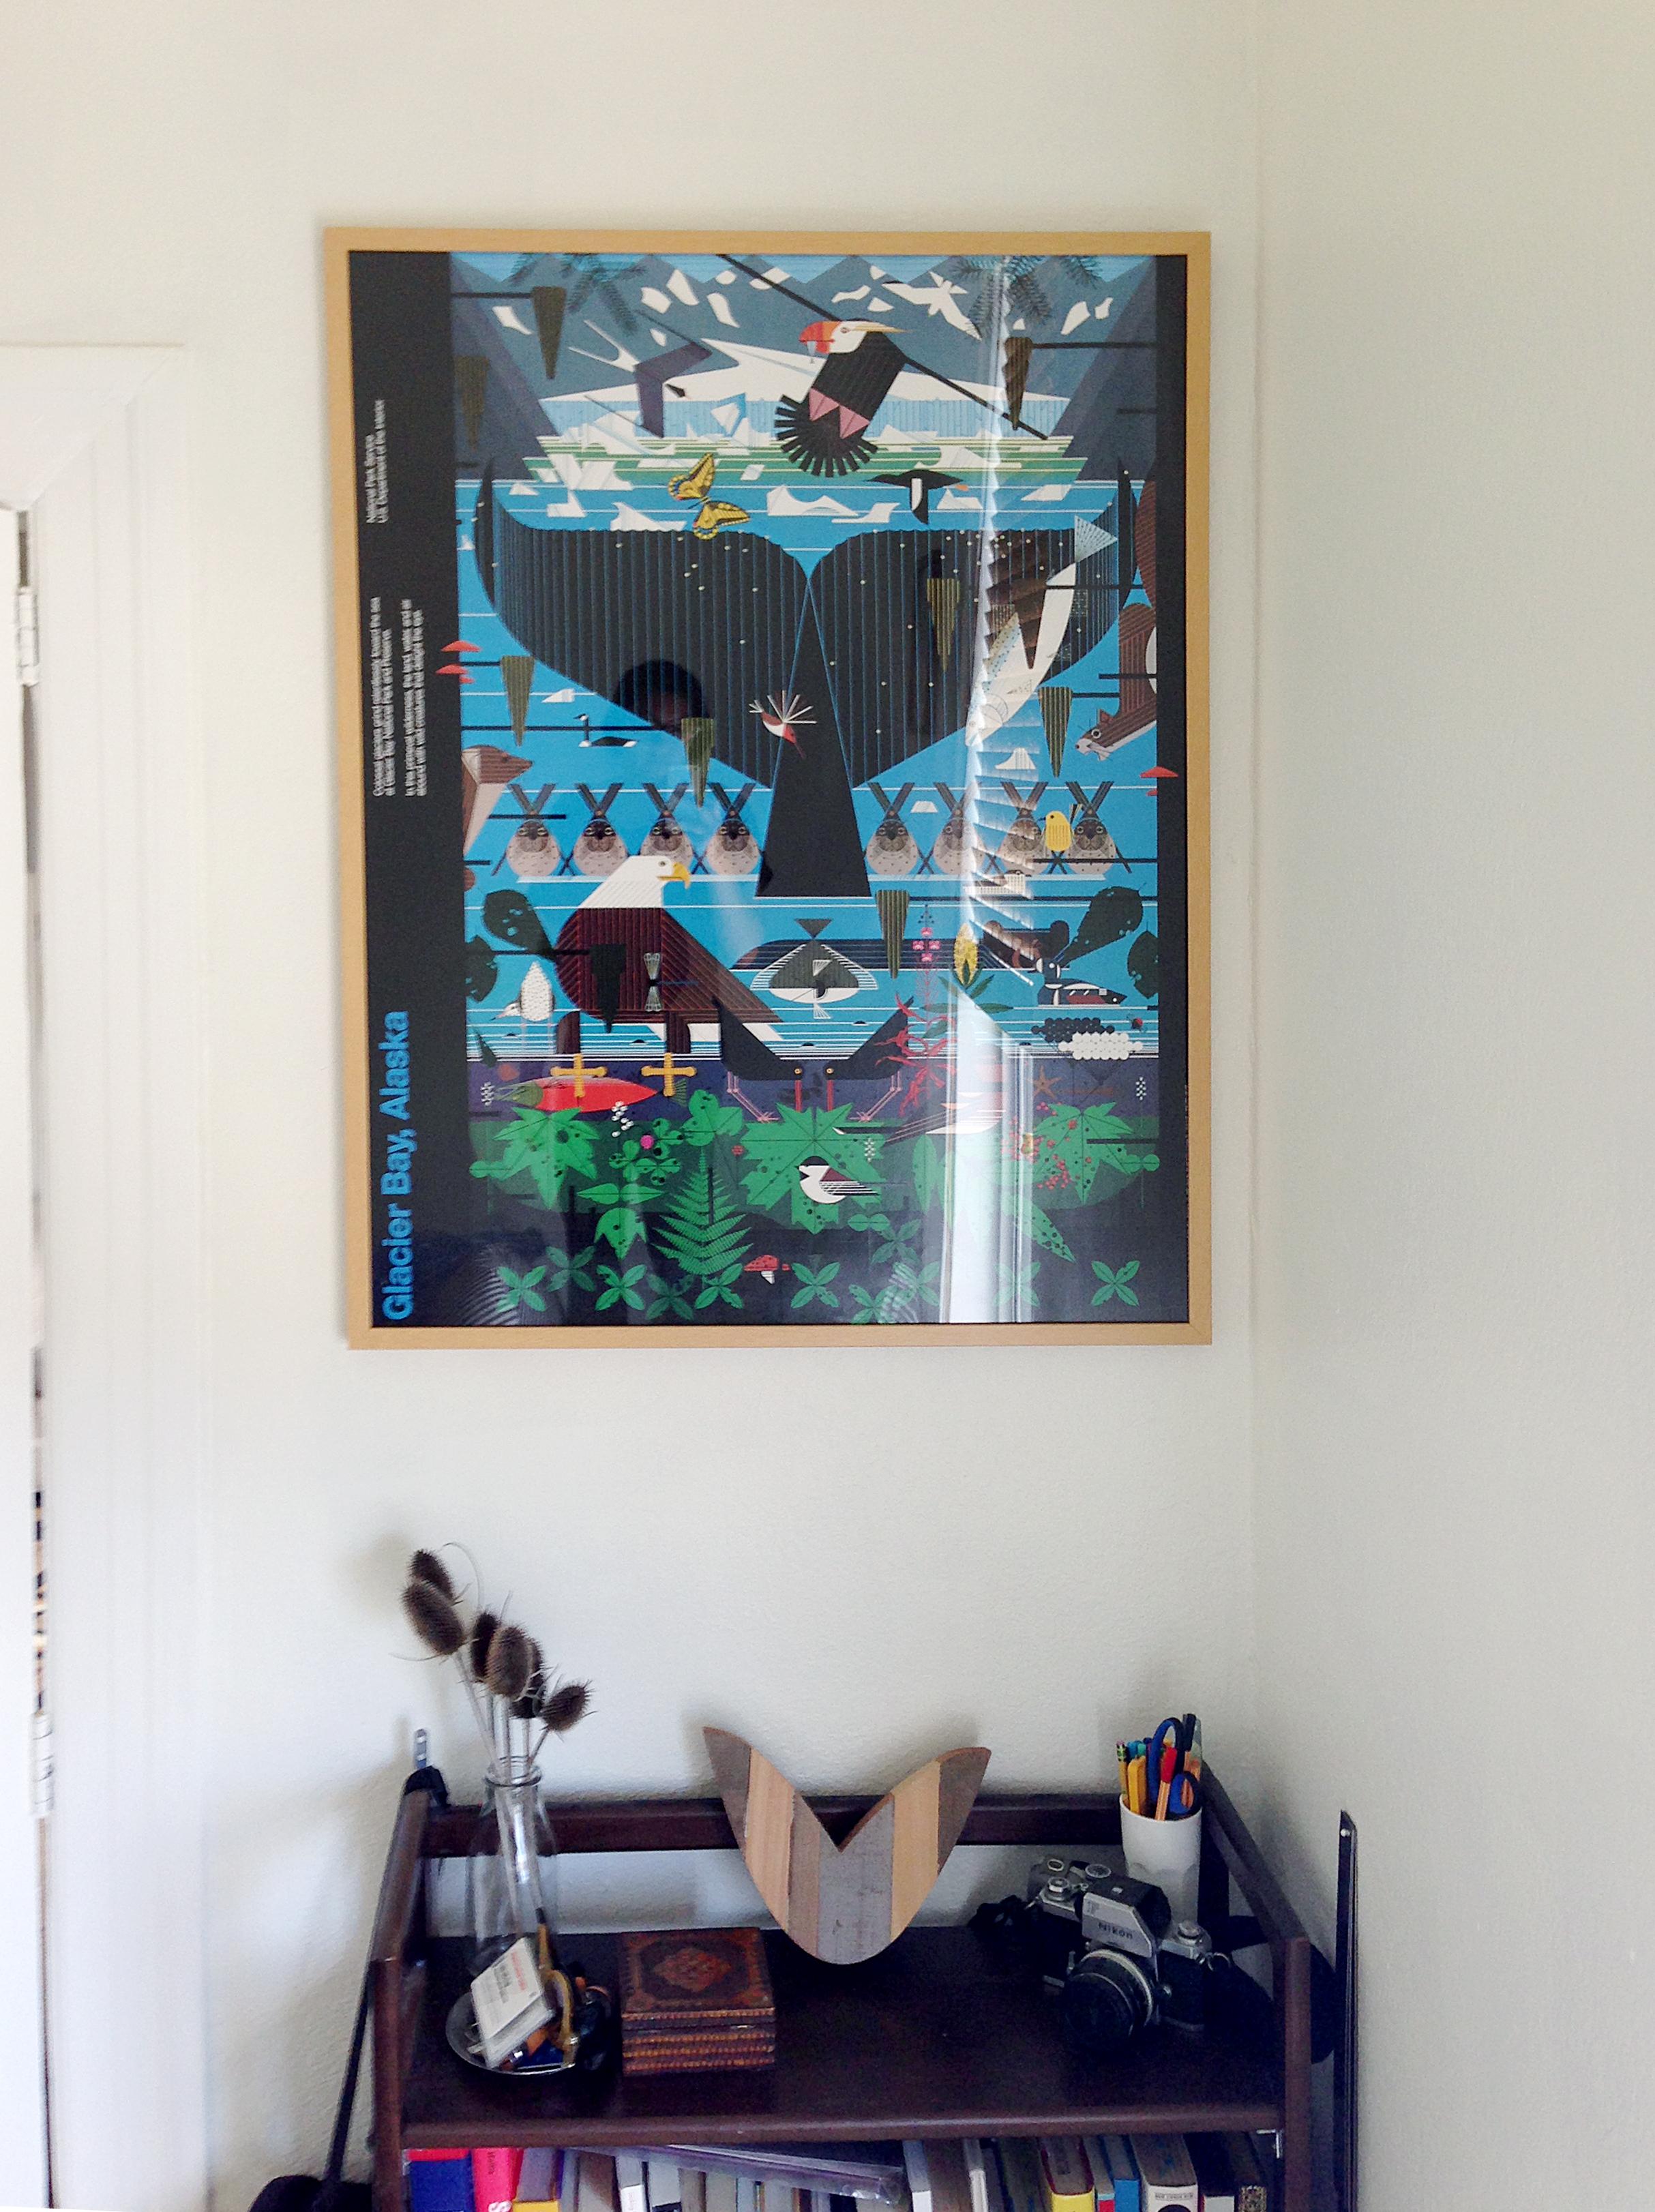 22 X 34 Poster Frame Mountary